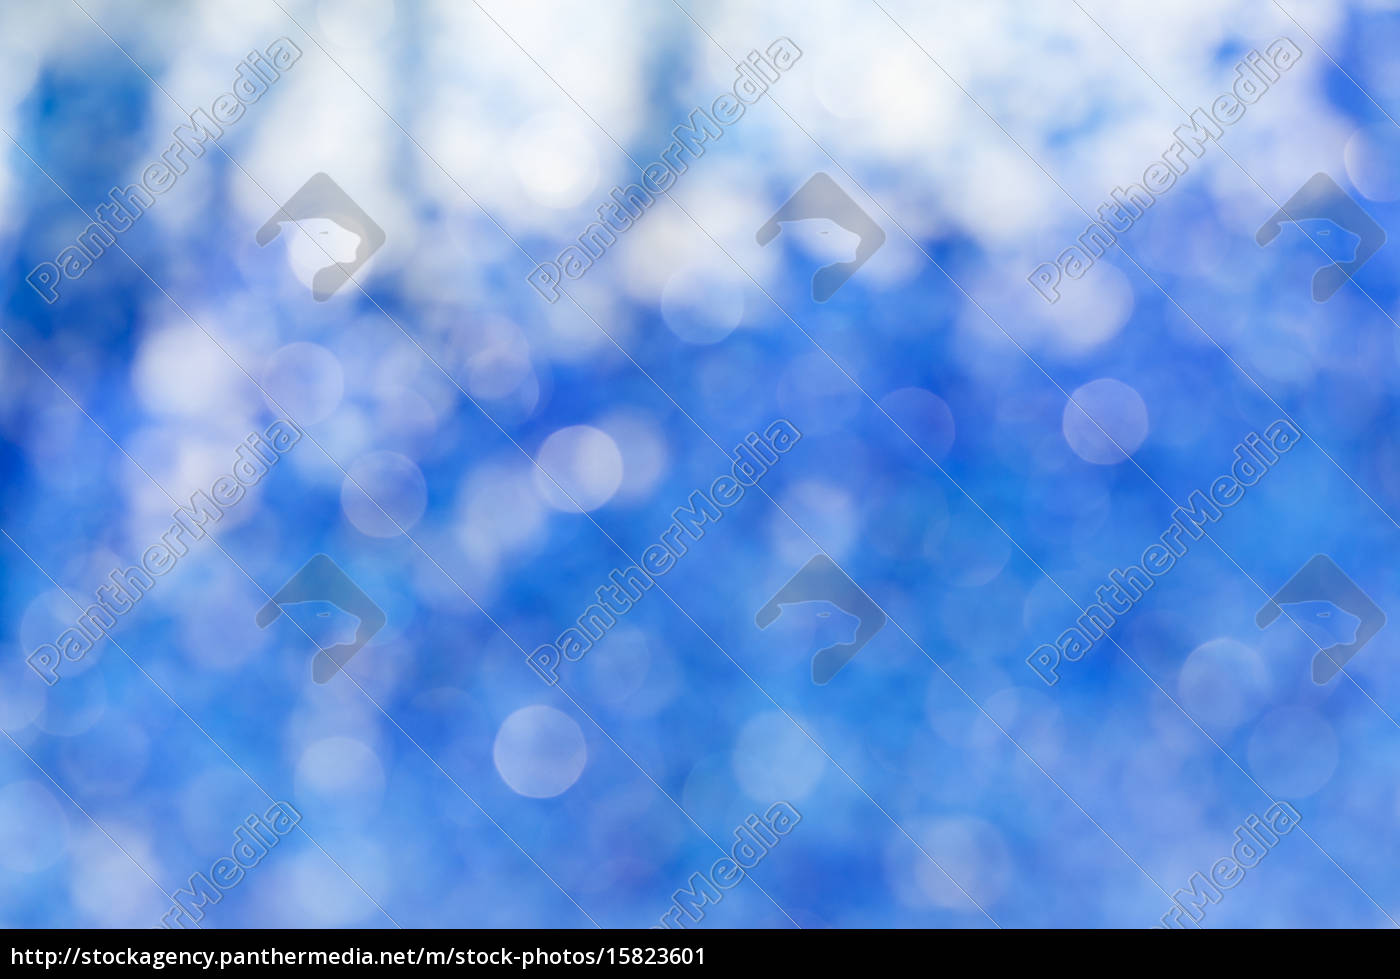 blue, blurred, background - 15823601